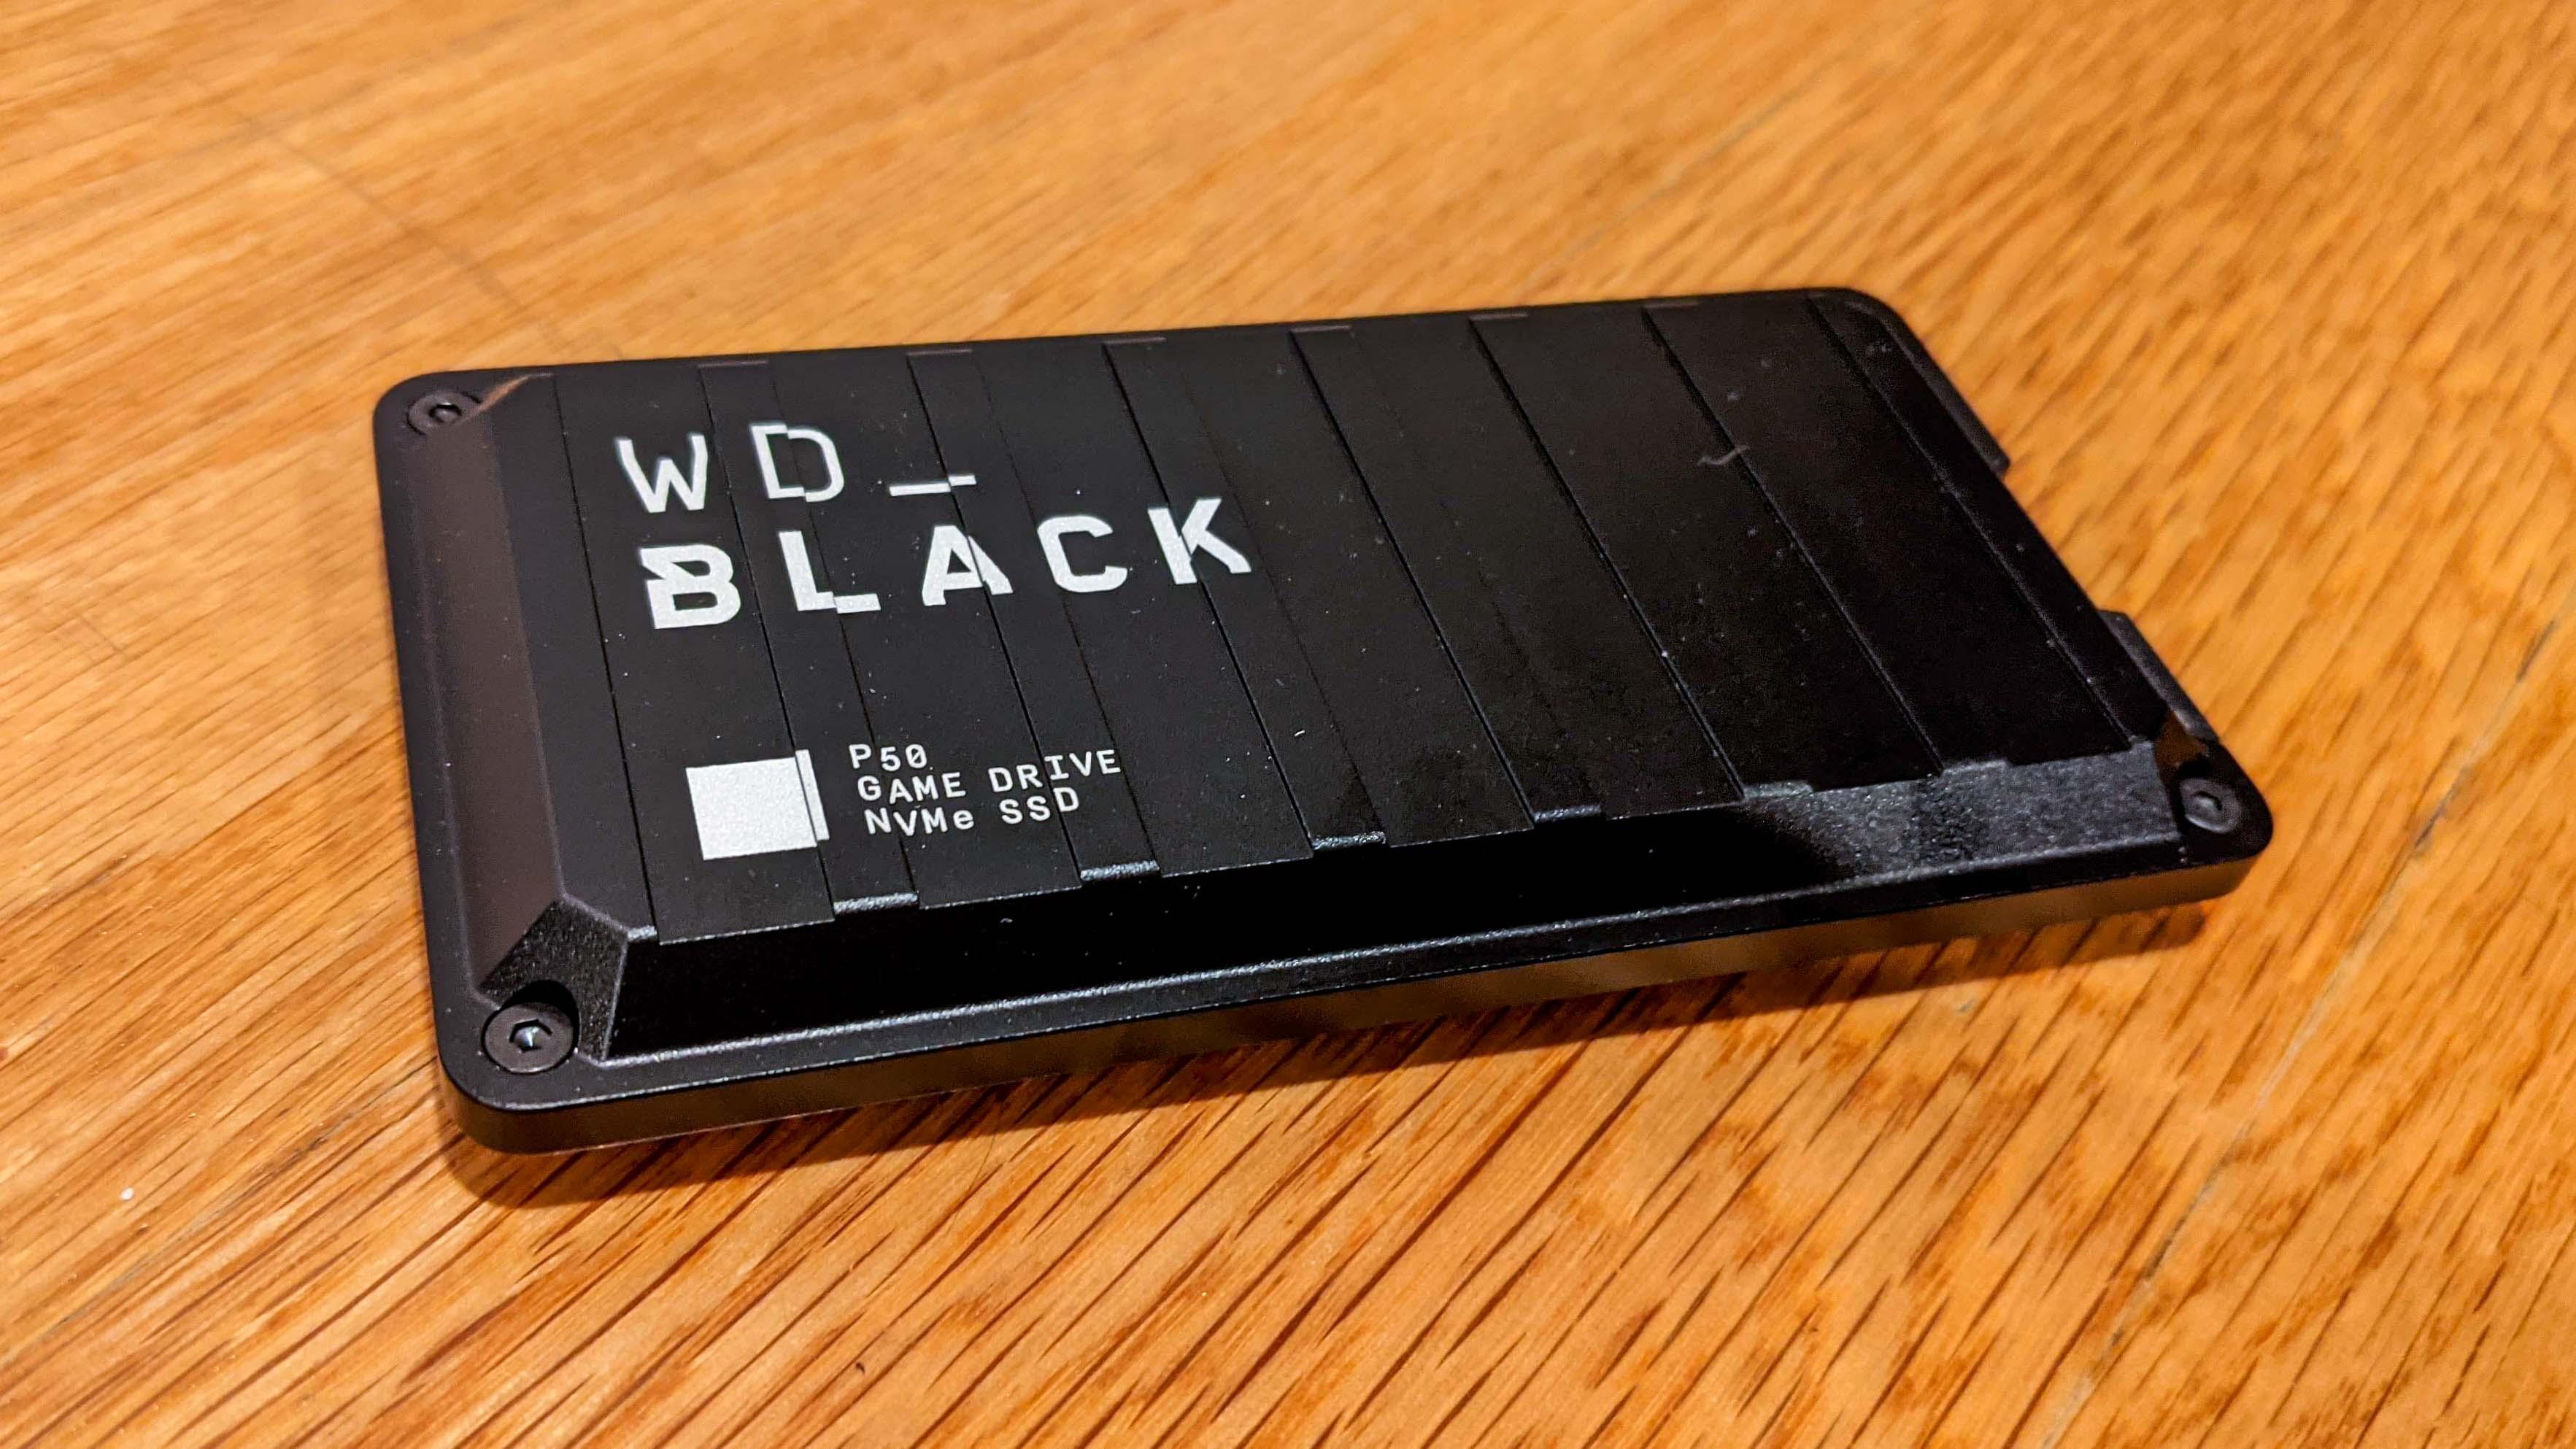 Best PS5 external hard drives: WD Black P50